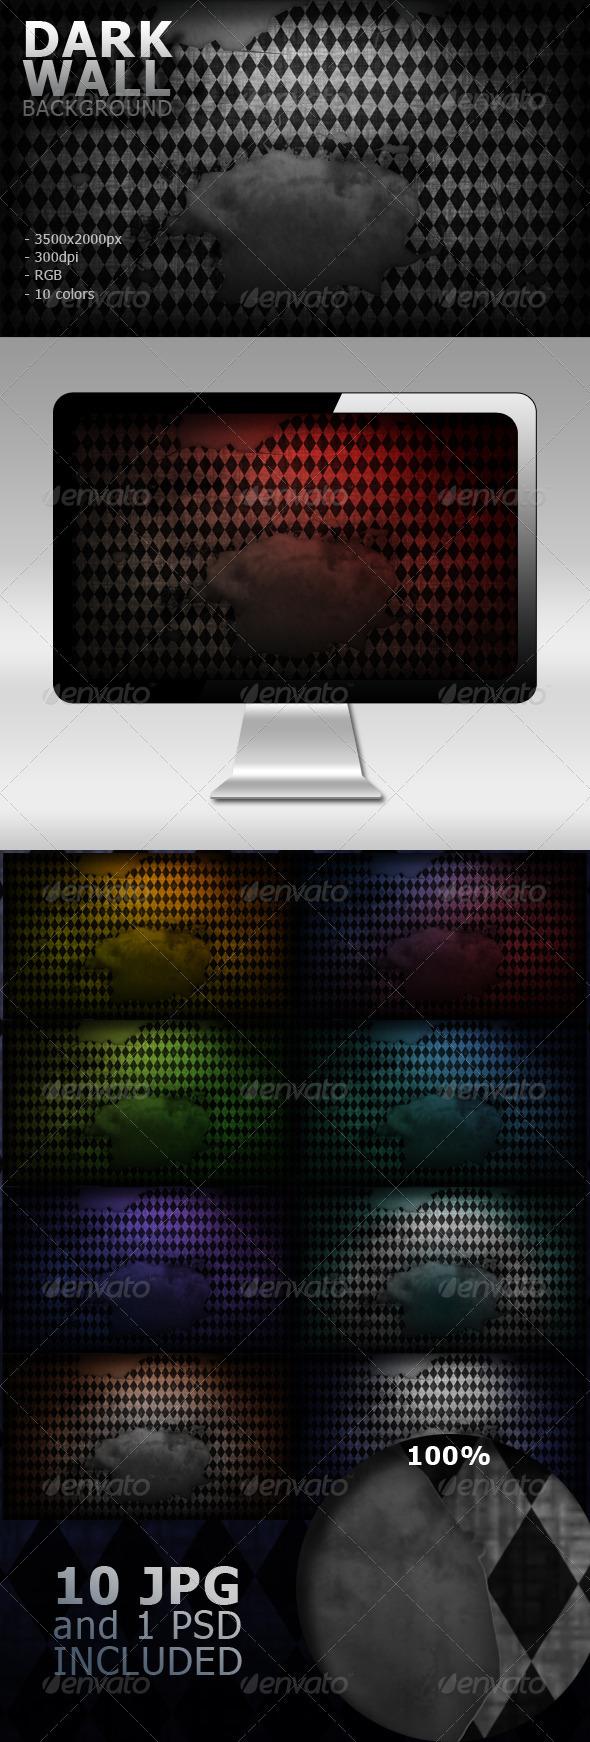 Dark Wall Background - Tech / Futuristic Backgrounds